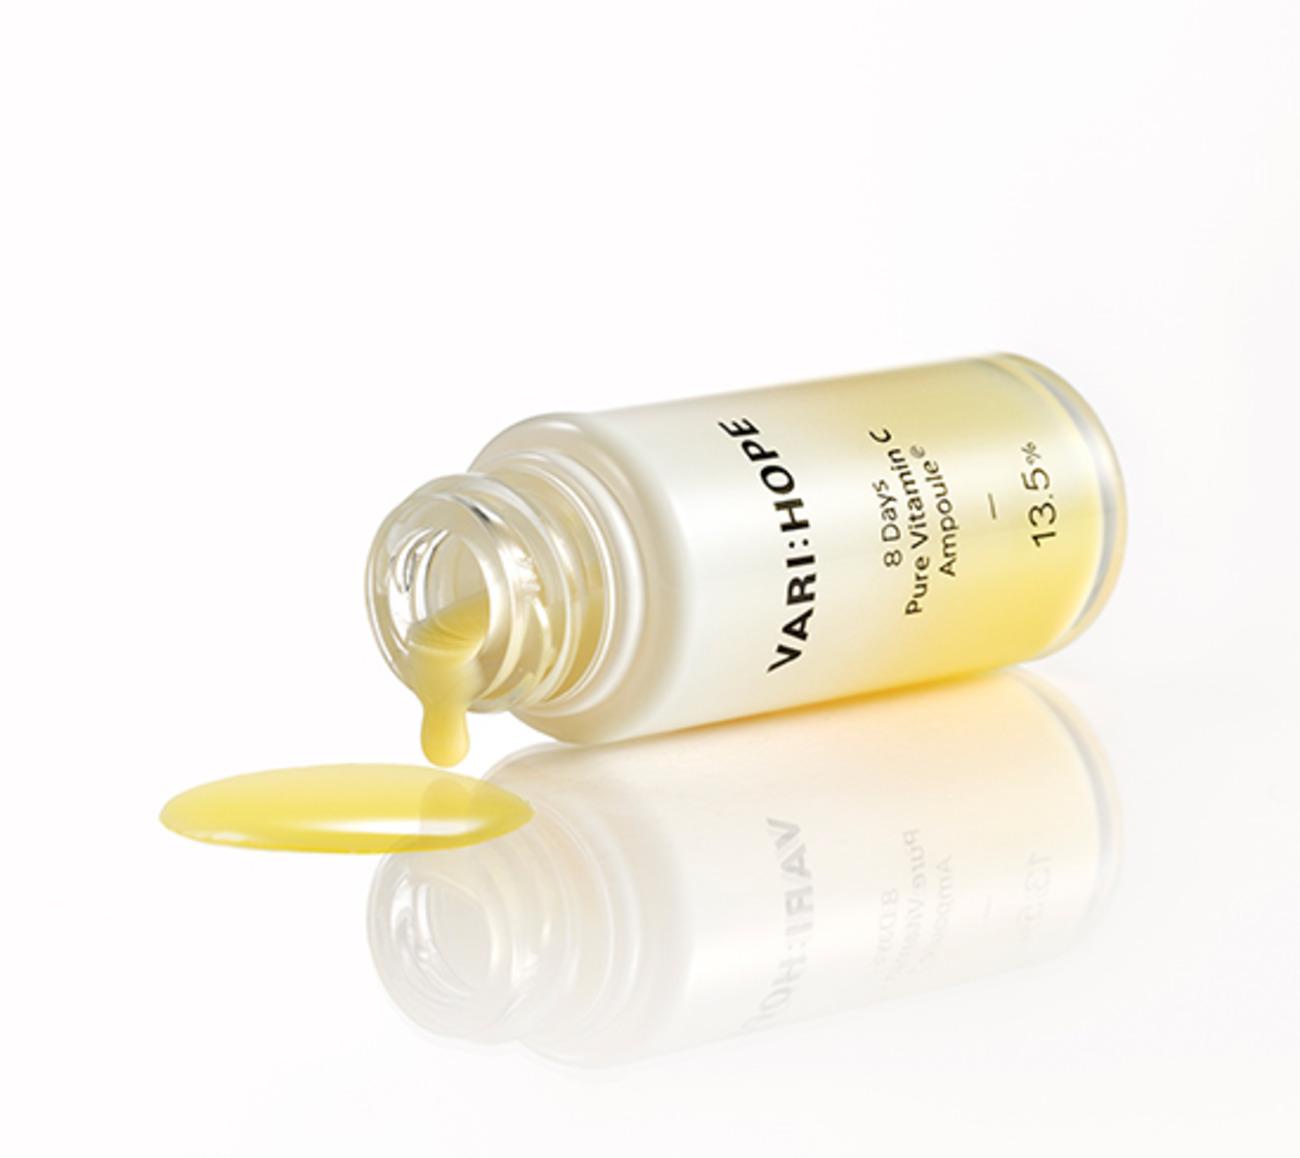 Tinh Chất Varihope 8 Day Pure Vitamin C Ampoule Plus Dưỡng Trắng Da Sau 8 Ngày 15g